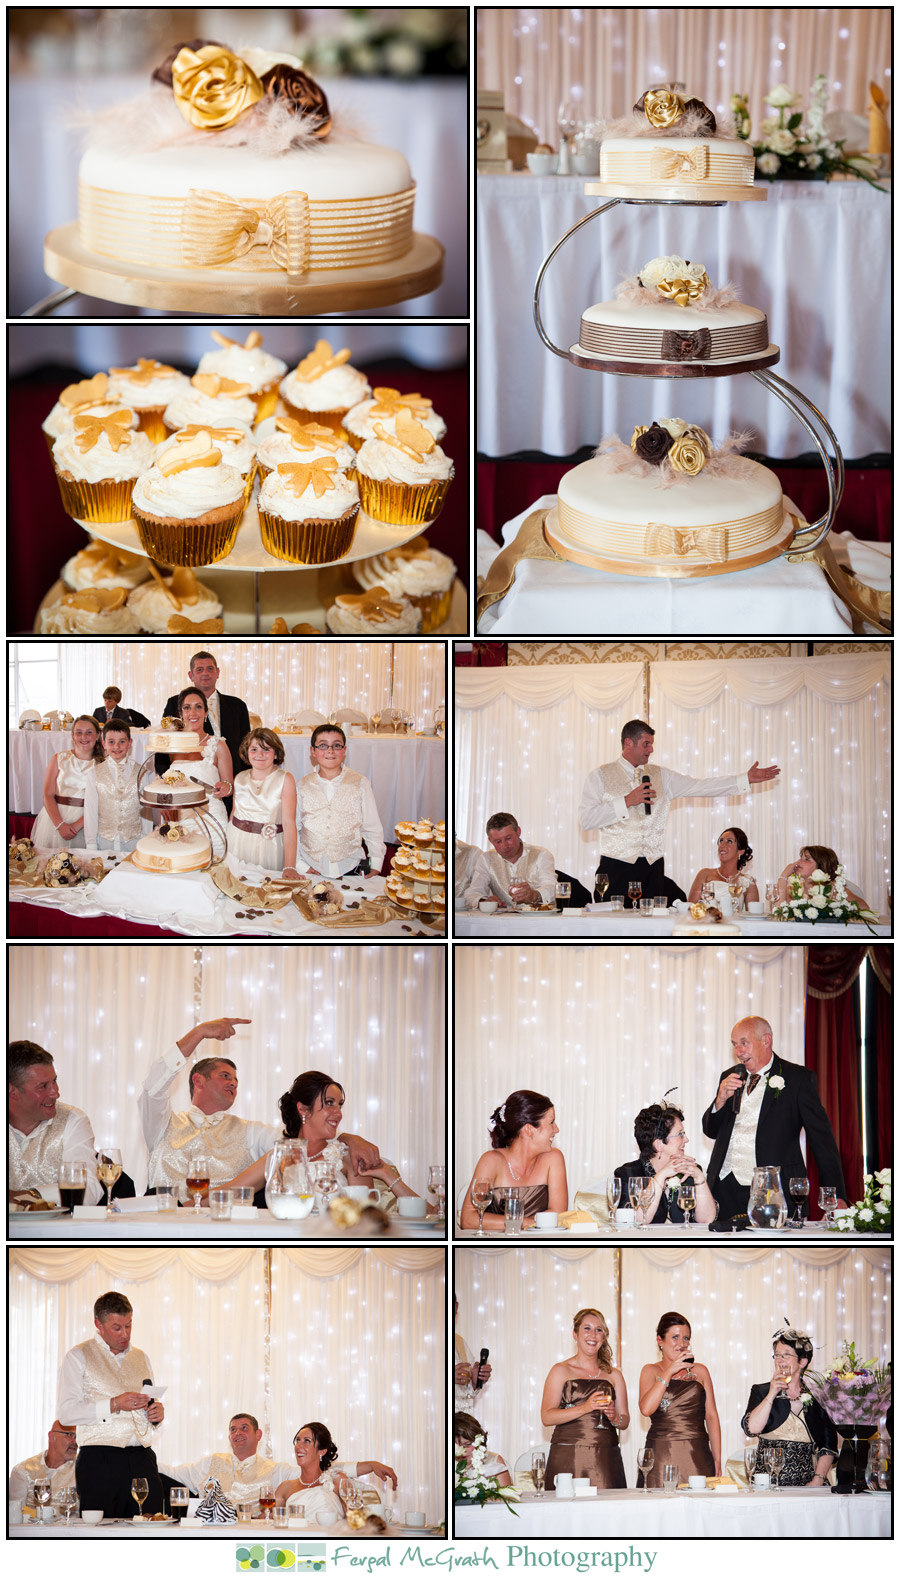 breda paul wedding photos great northern hotel bundoran 10